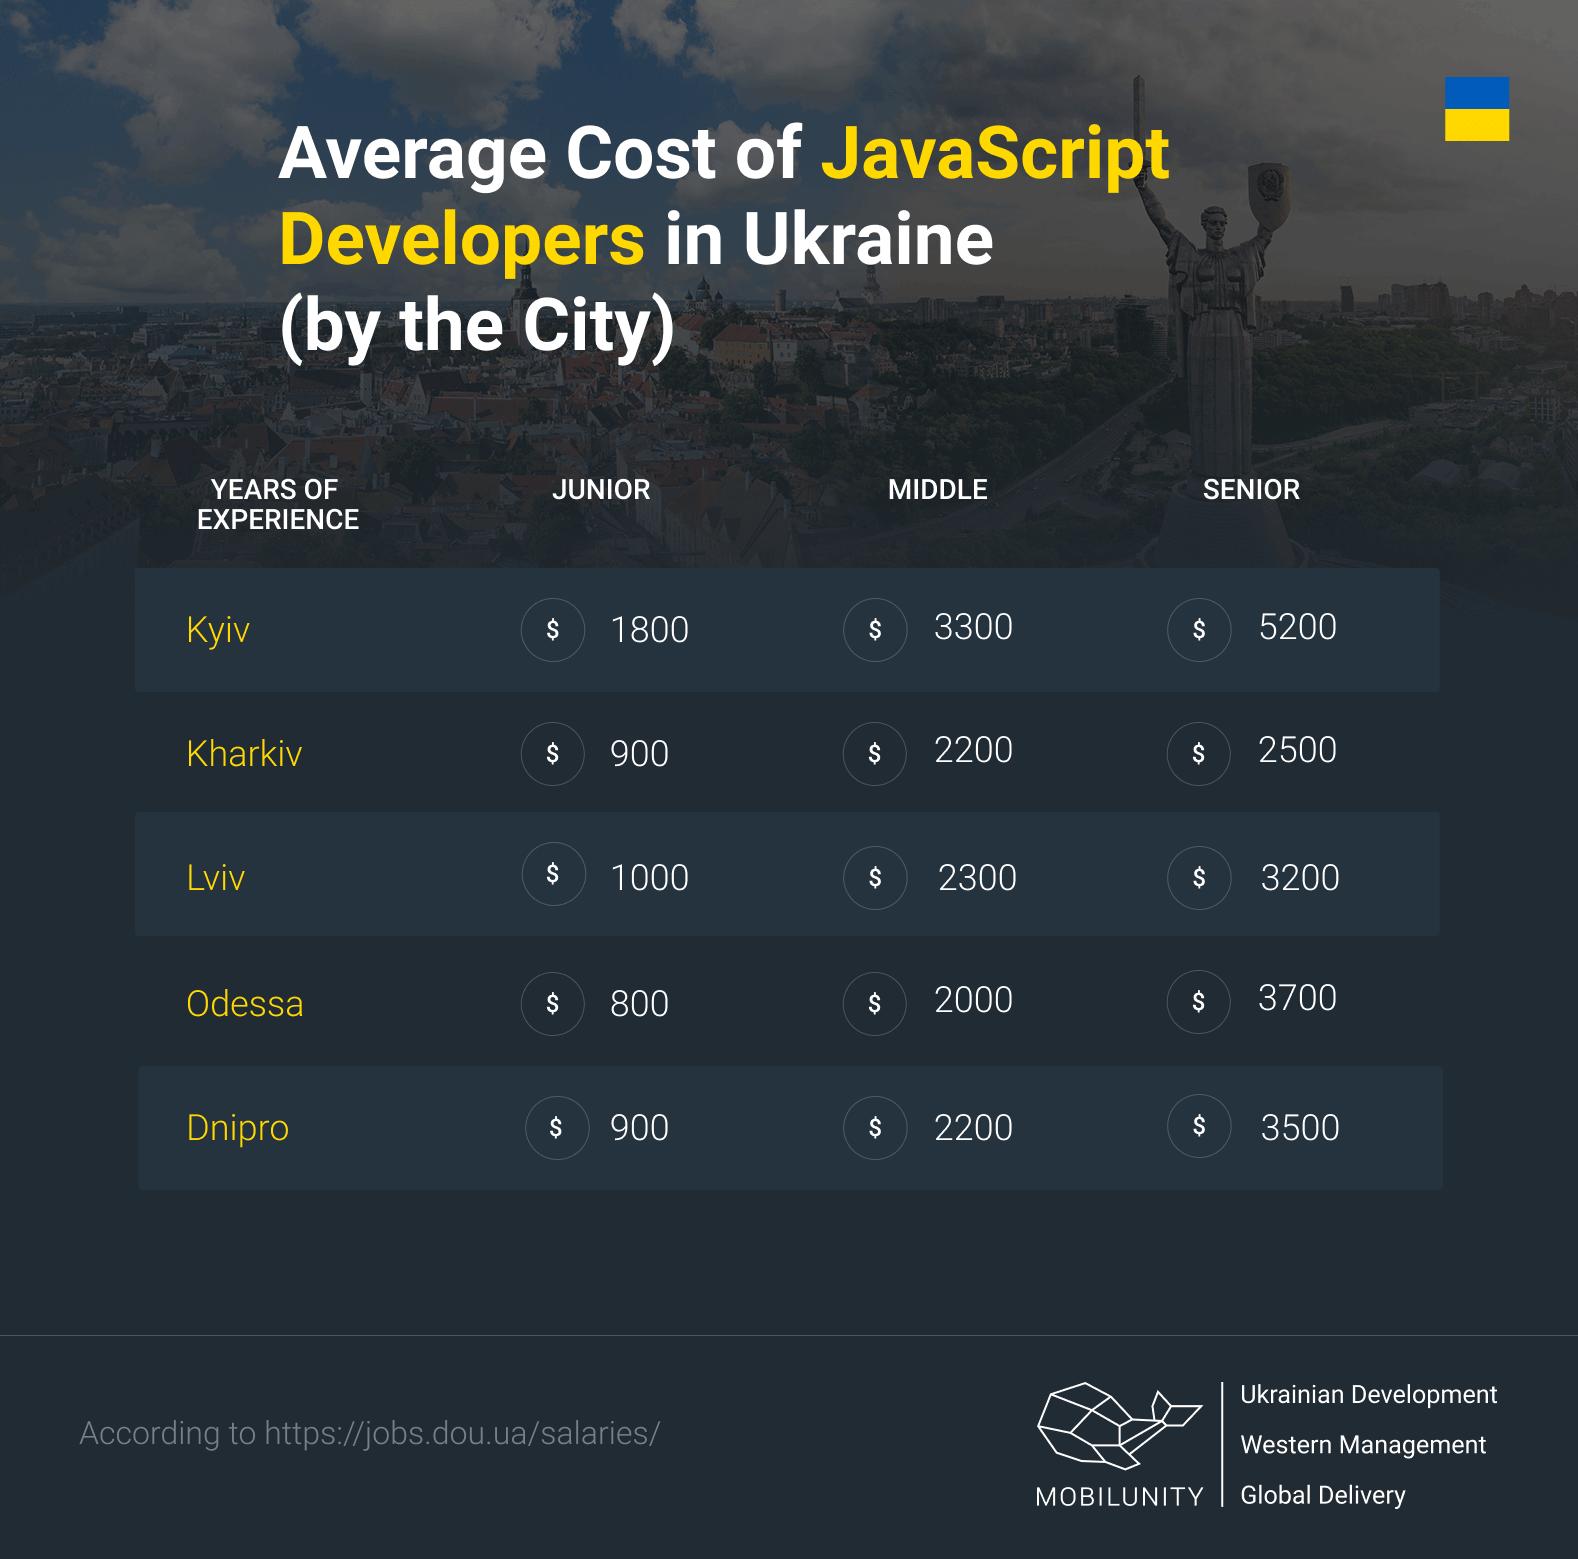 cost of javascript developer in Ukraine